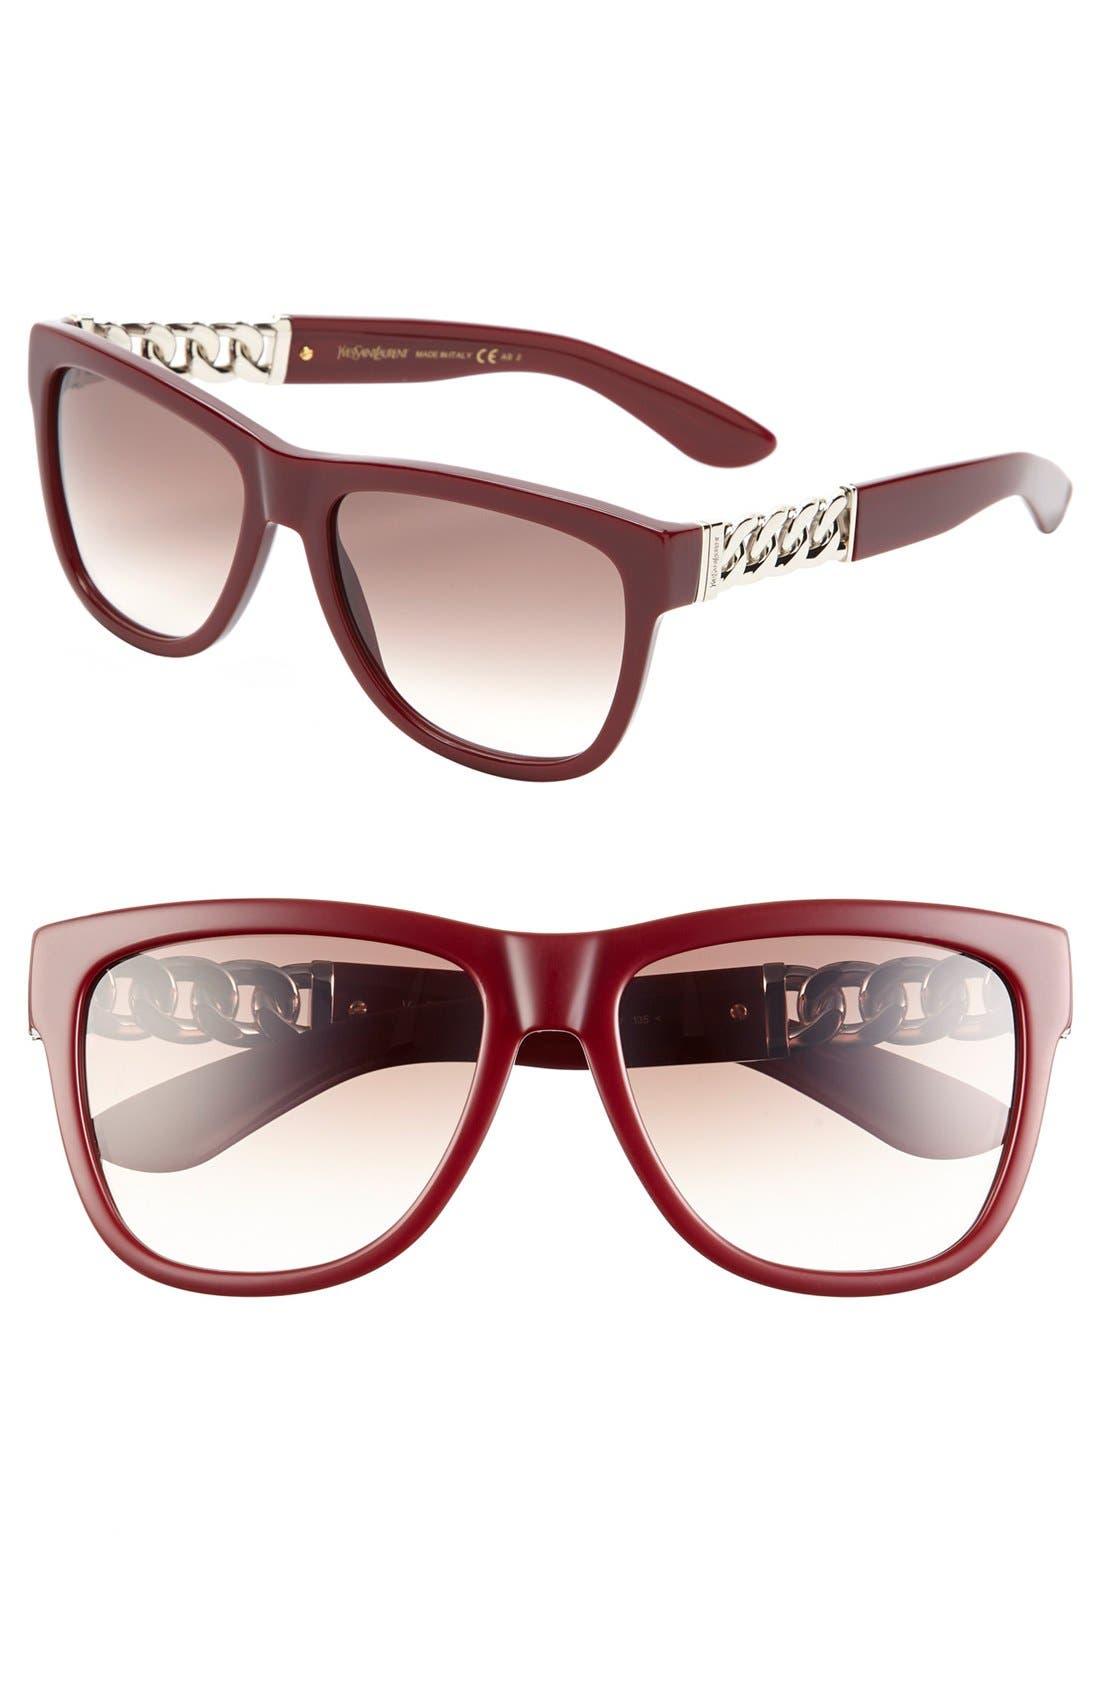 Main Image - Saint Laurent 56mm Oversized Sunglasses